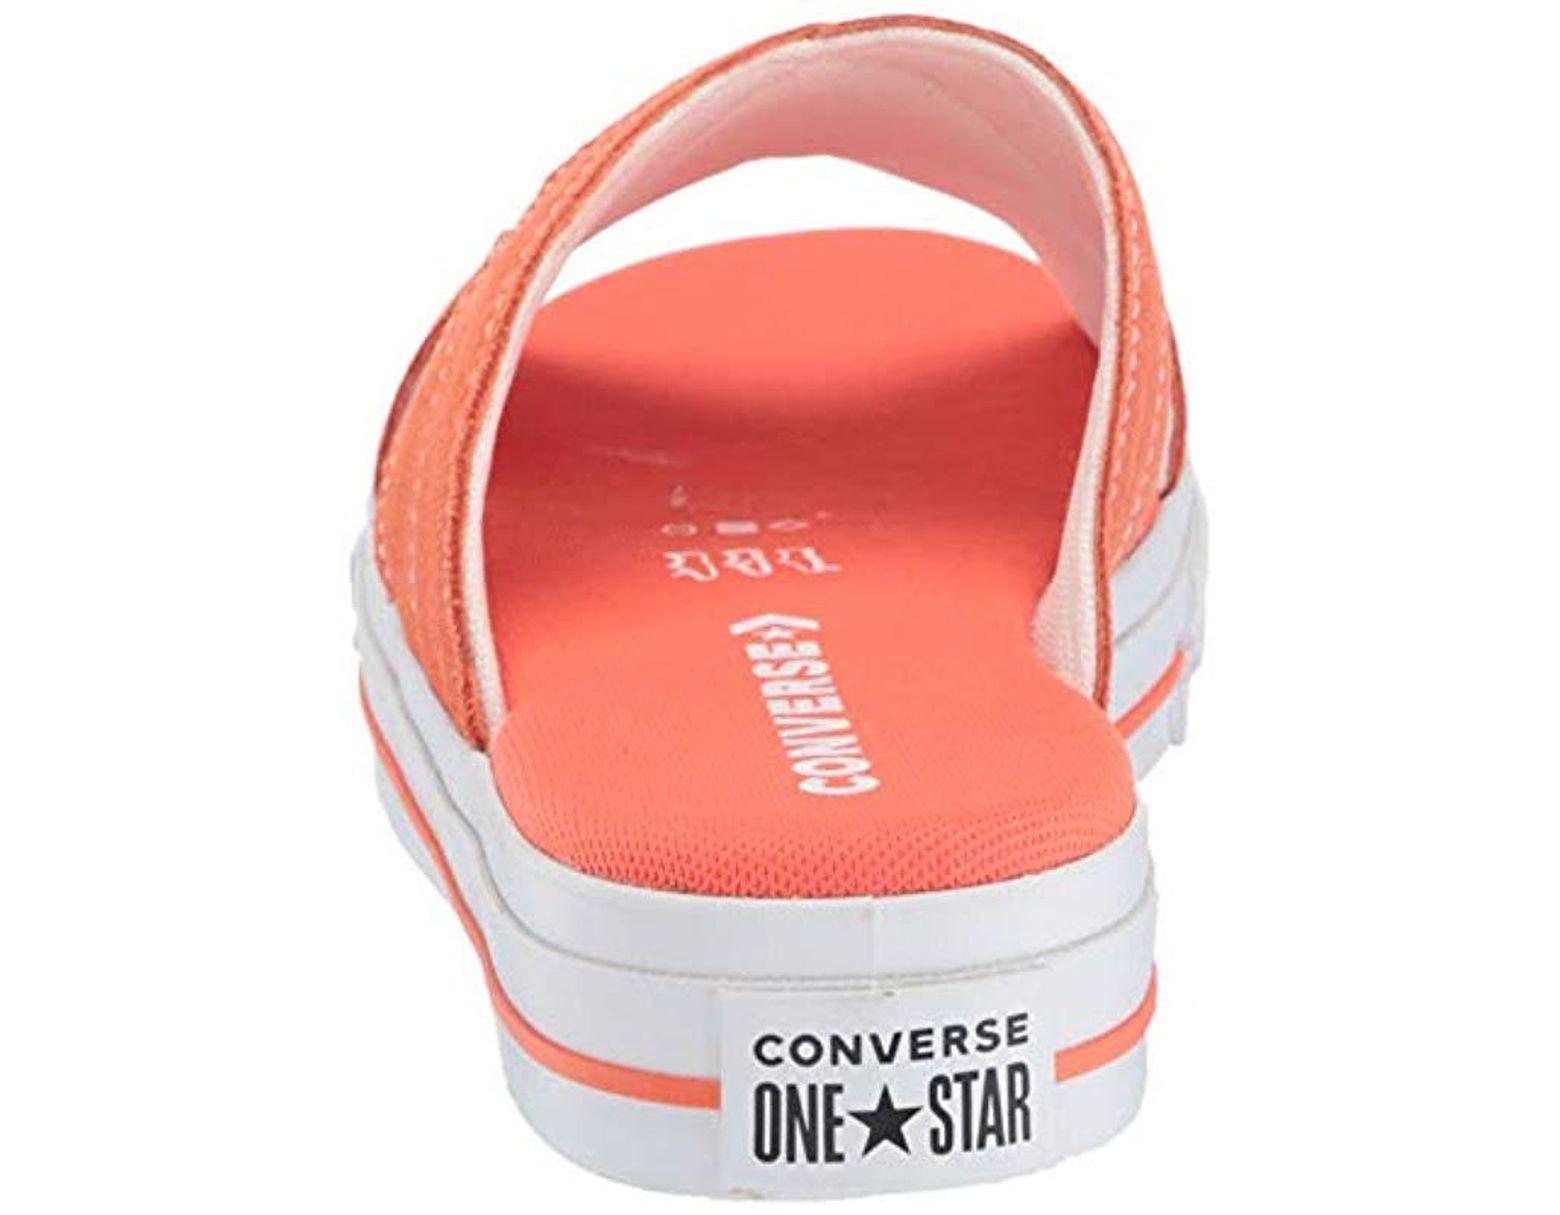 One Slip Suede Star Converse Lyst Sandal Ib6ymYfgv7